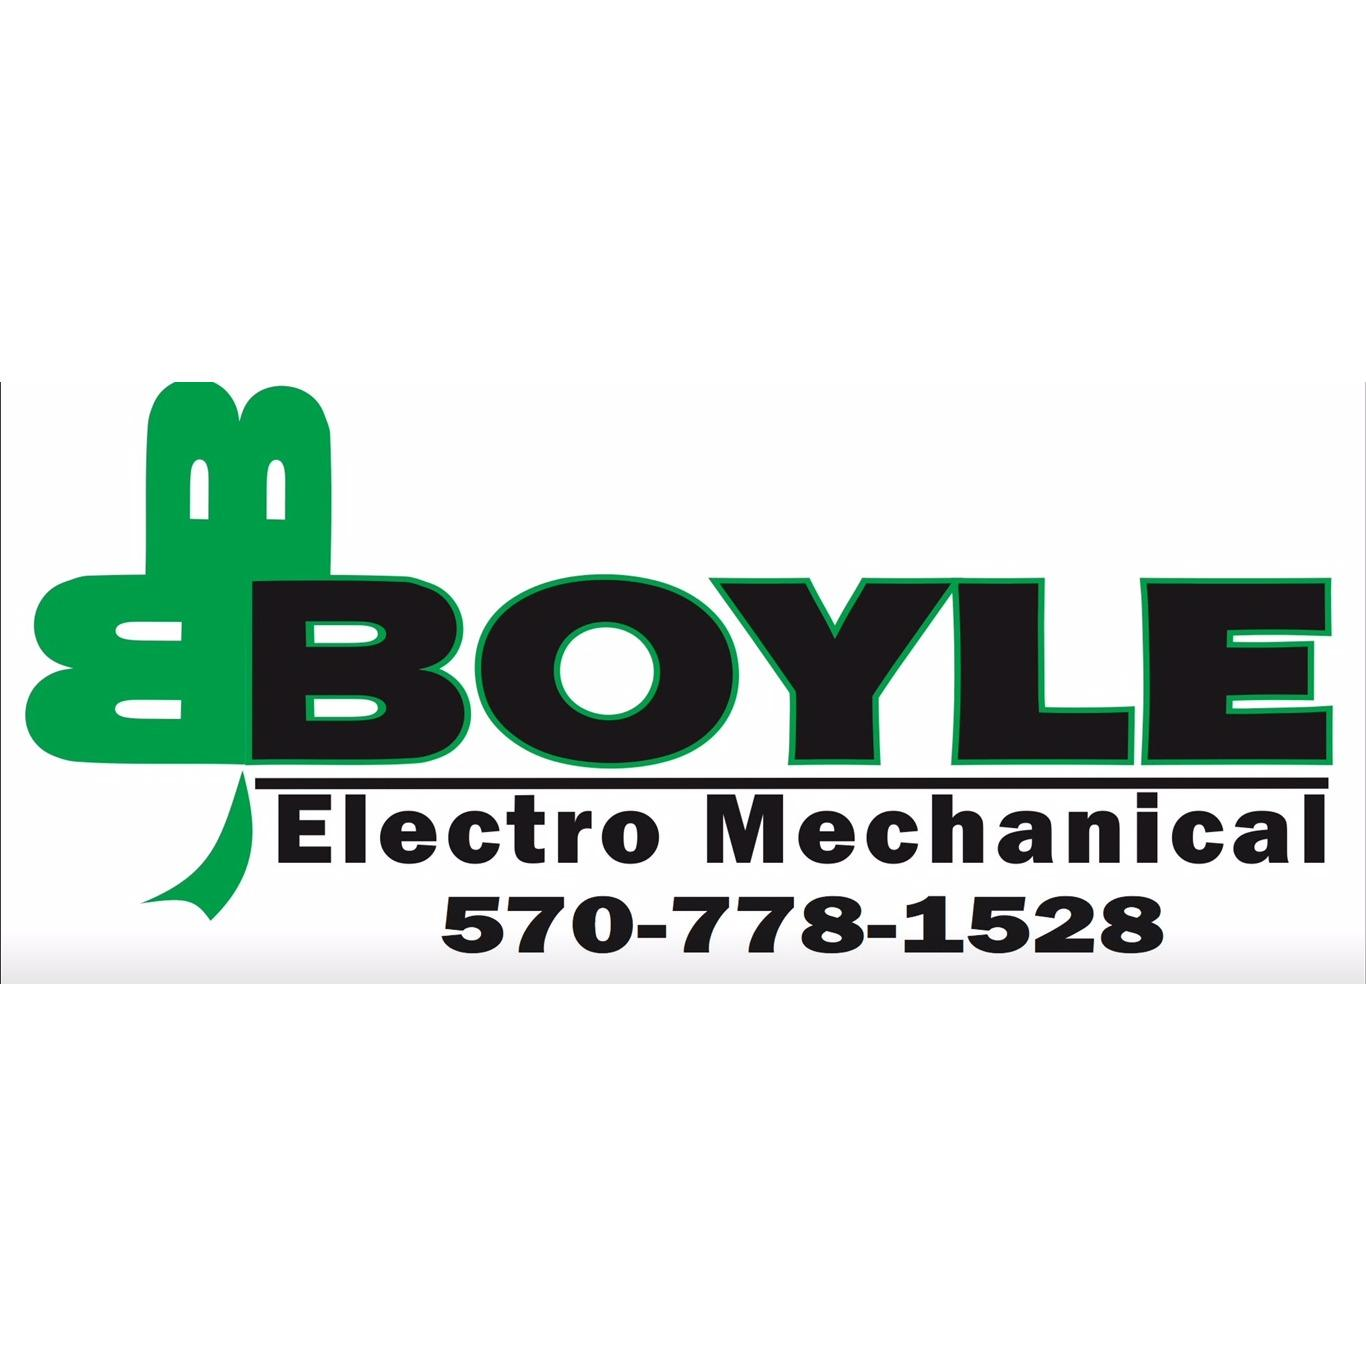 Boyle Electro Mechanical Logo